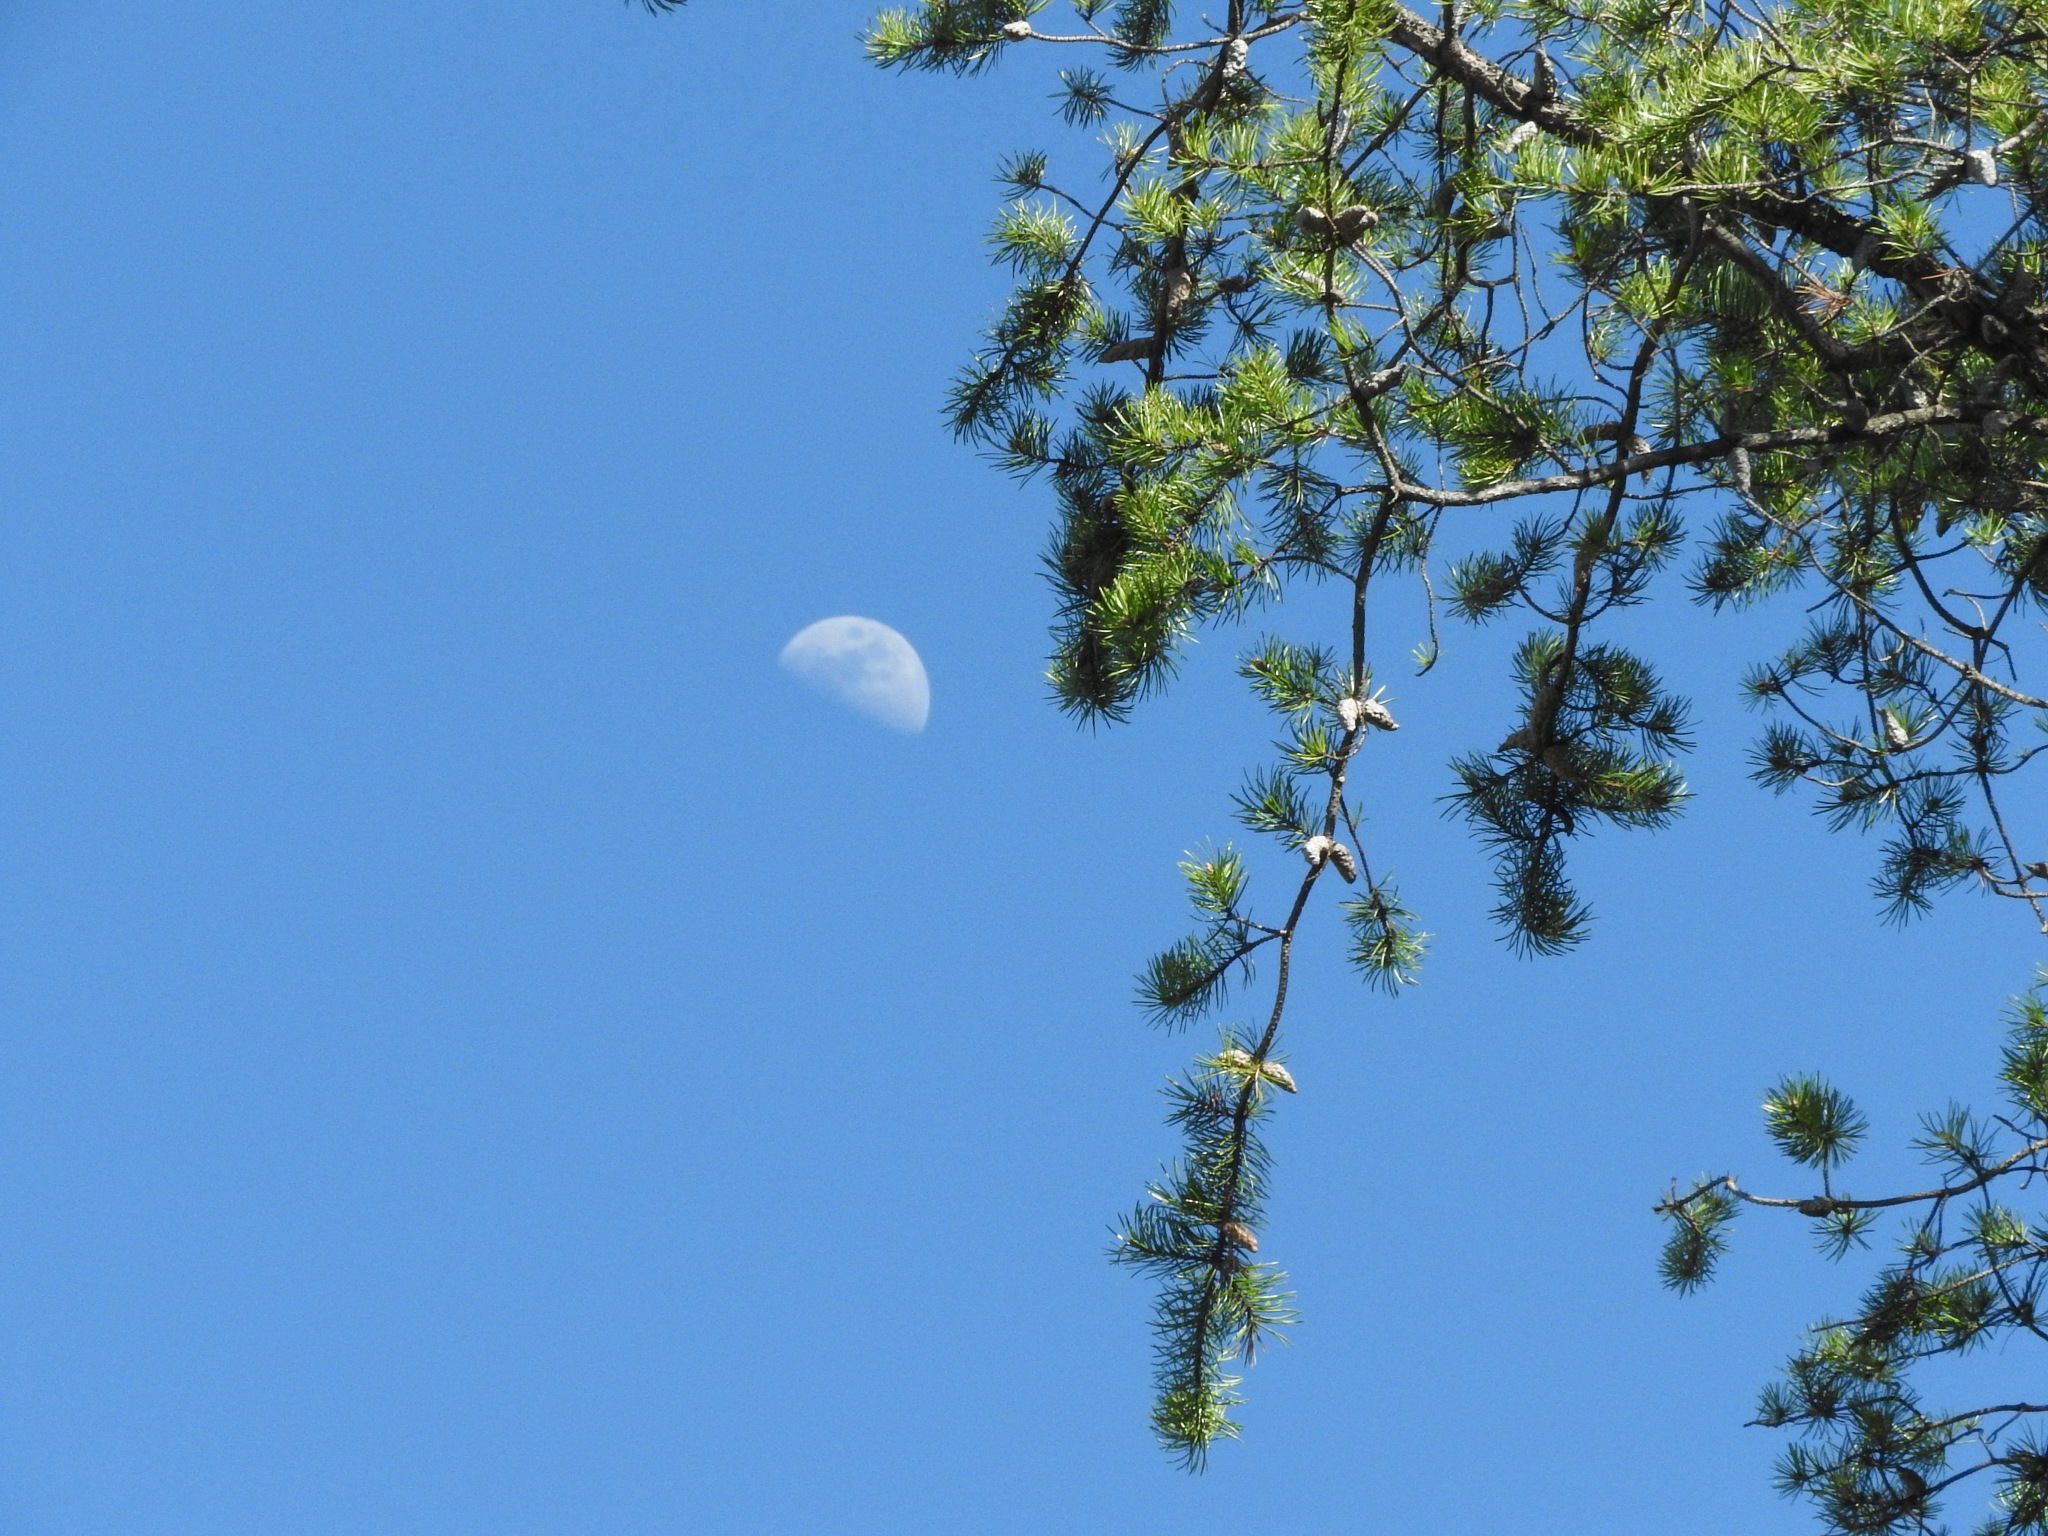 Pretty moon last nite by Lorraine Furmanic